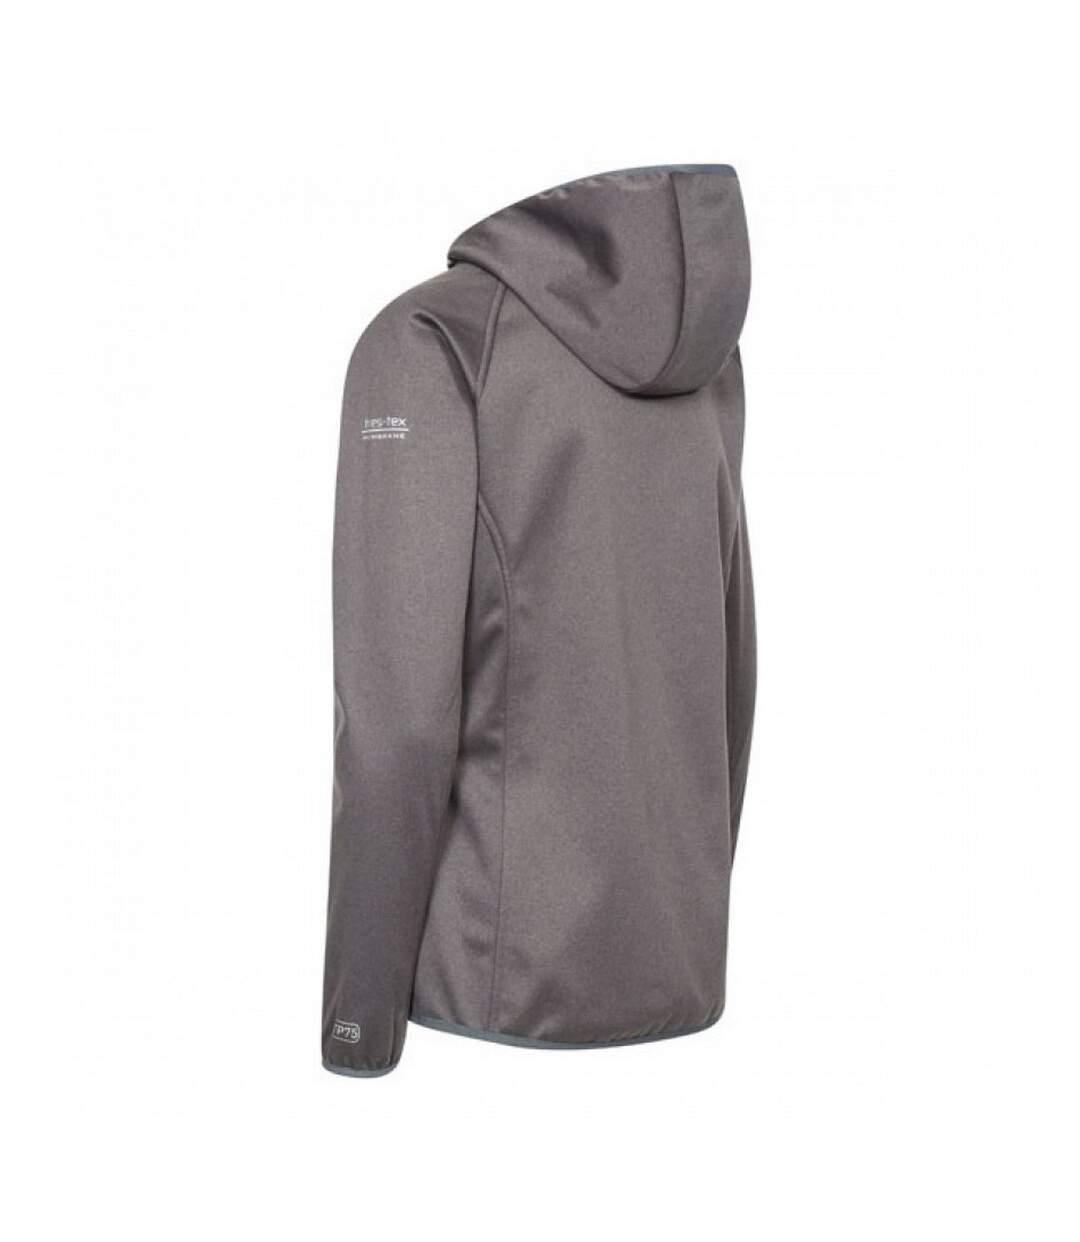 Trespass Womens/Ladies Shelly Waterproof Softshell Jacket (Carbon Marl) - UTTP3623